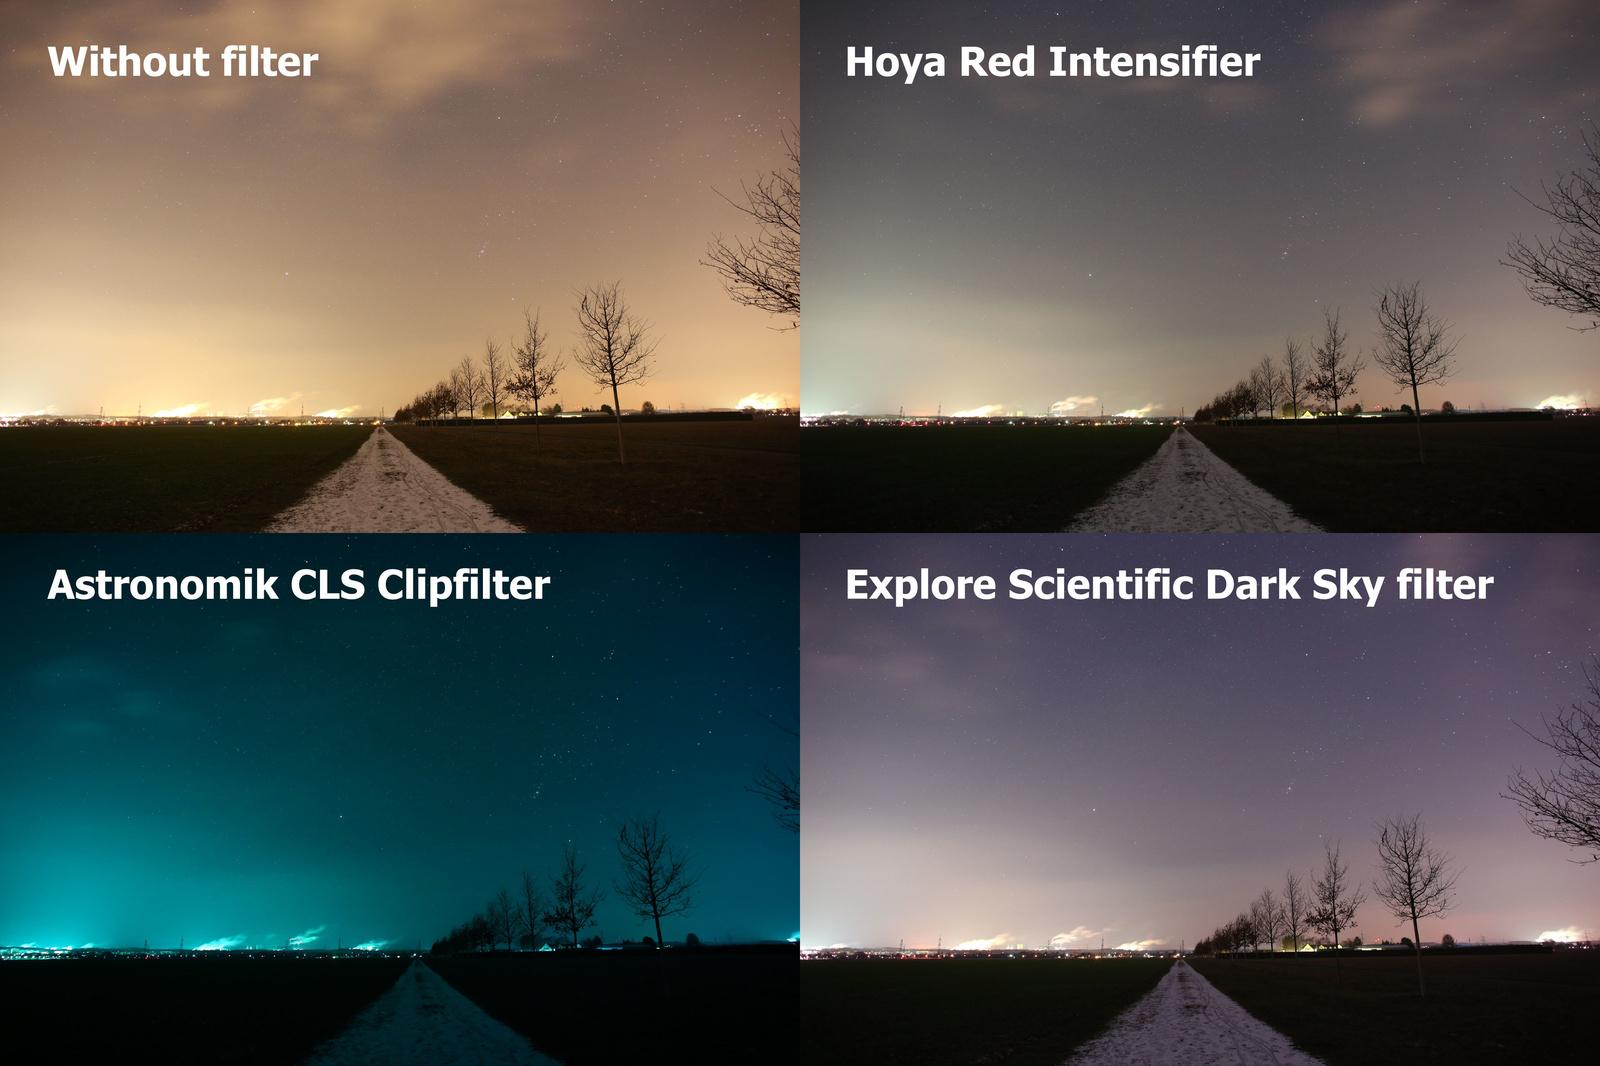 light_pollution_filter_5DIII.thumb.jpg.a965ddf8a13272f26321061c031e0a87.jpg